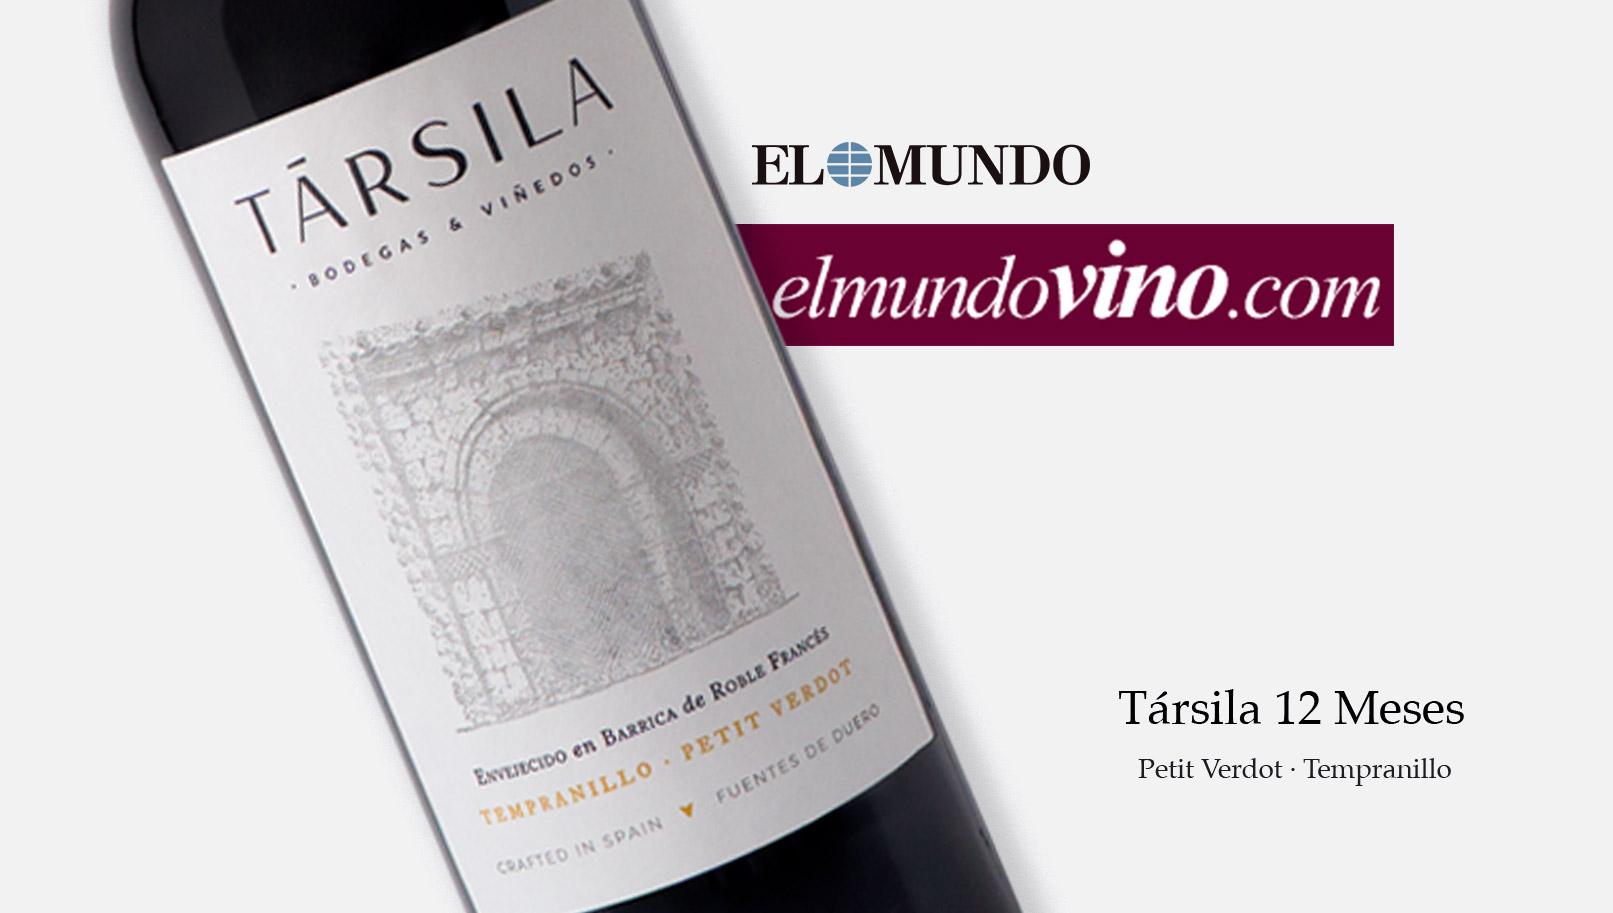 tasting-mundo-vino-tarsila-12-months.jpg